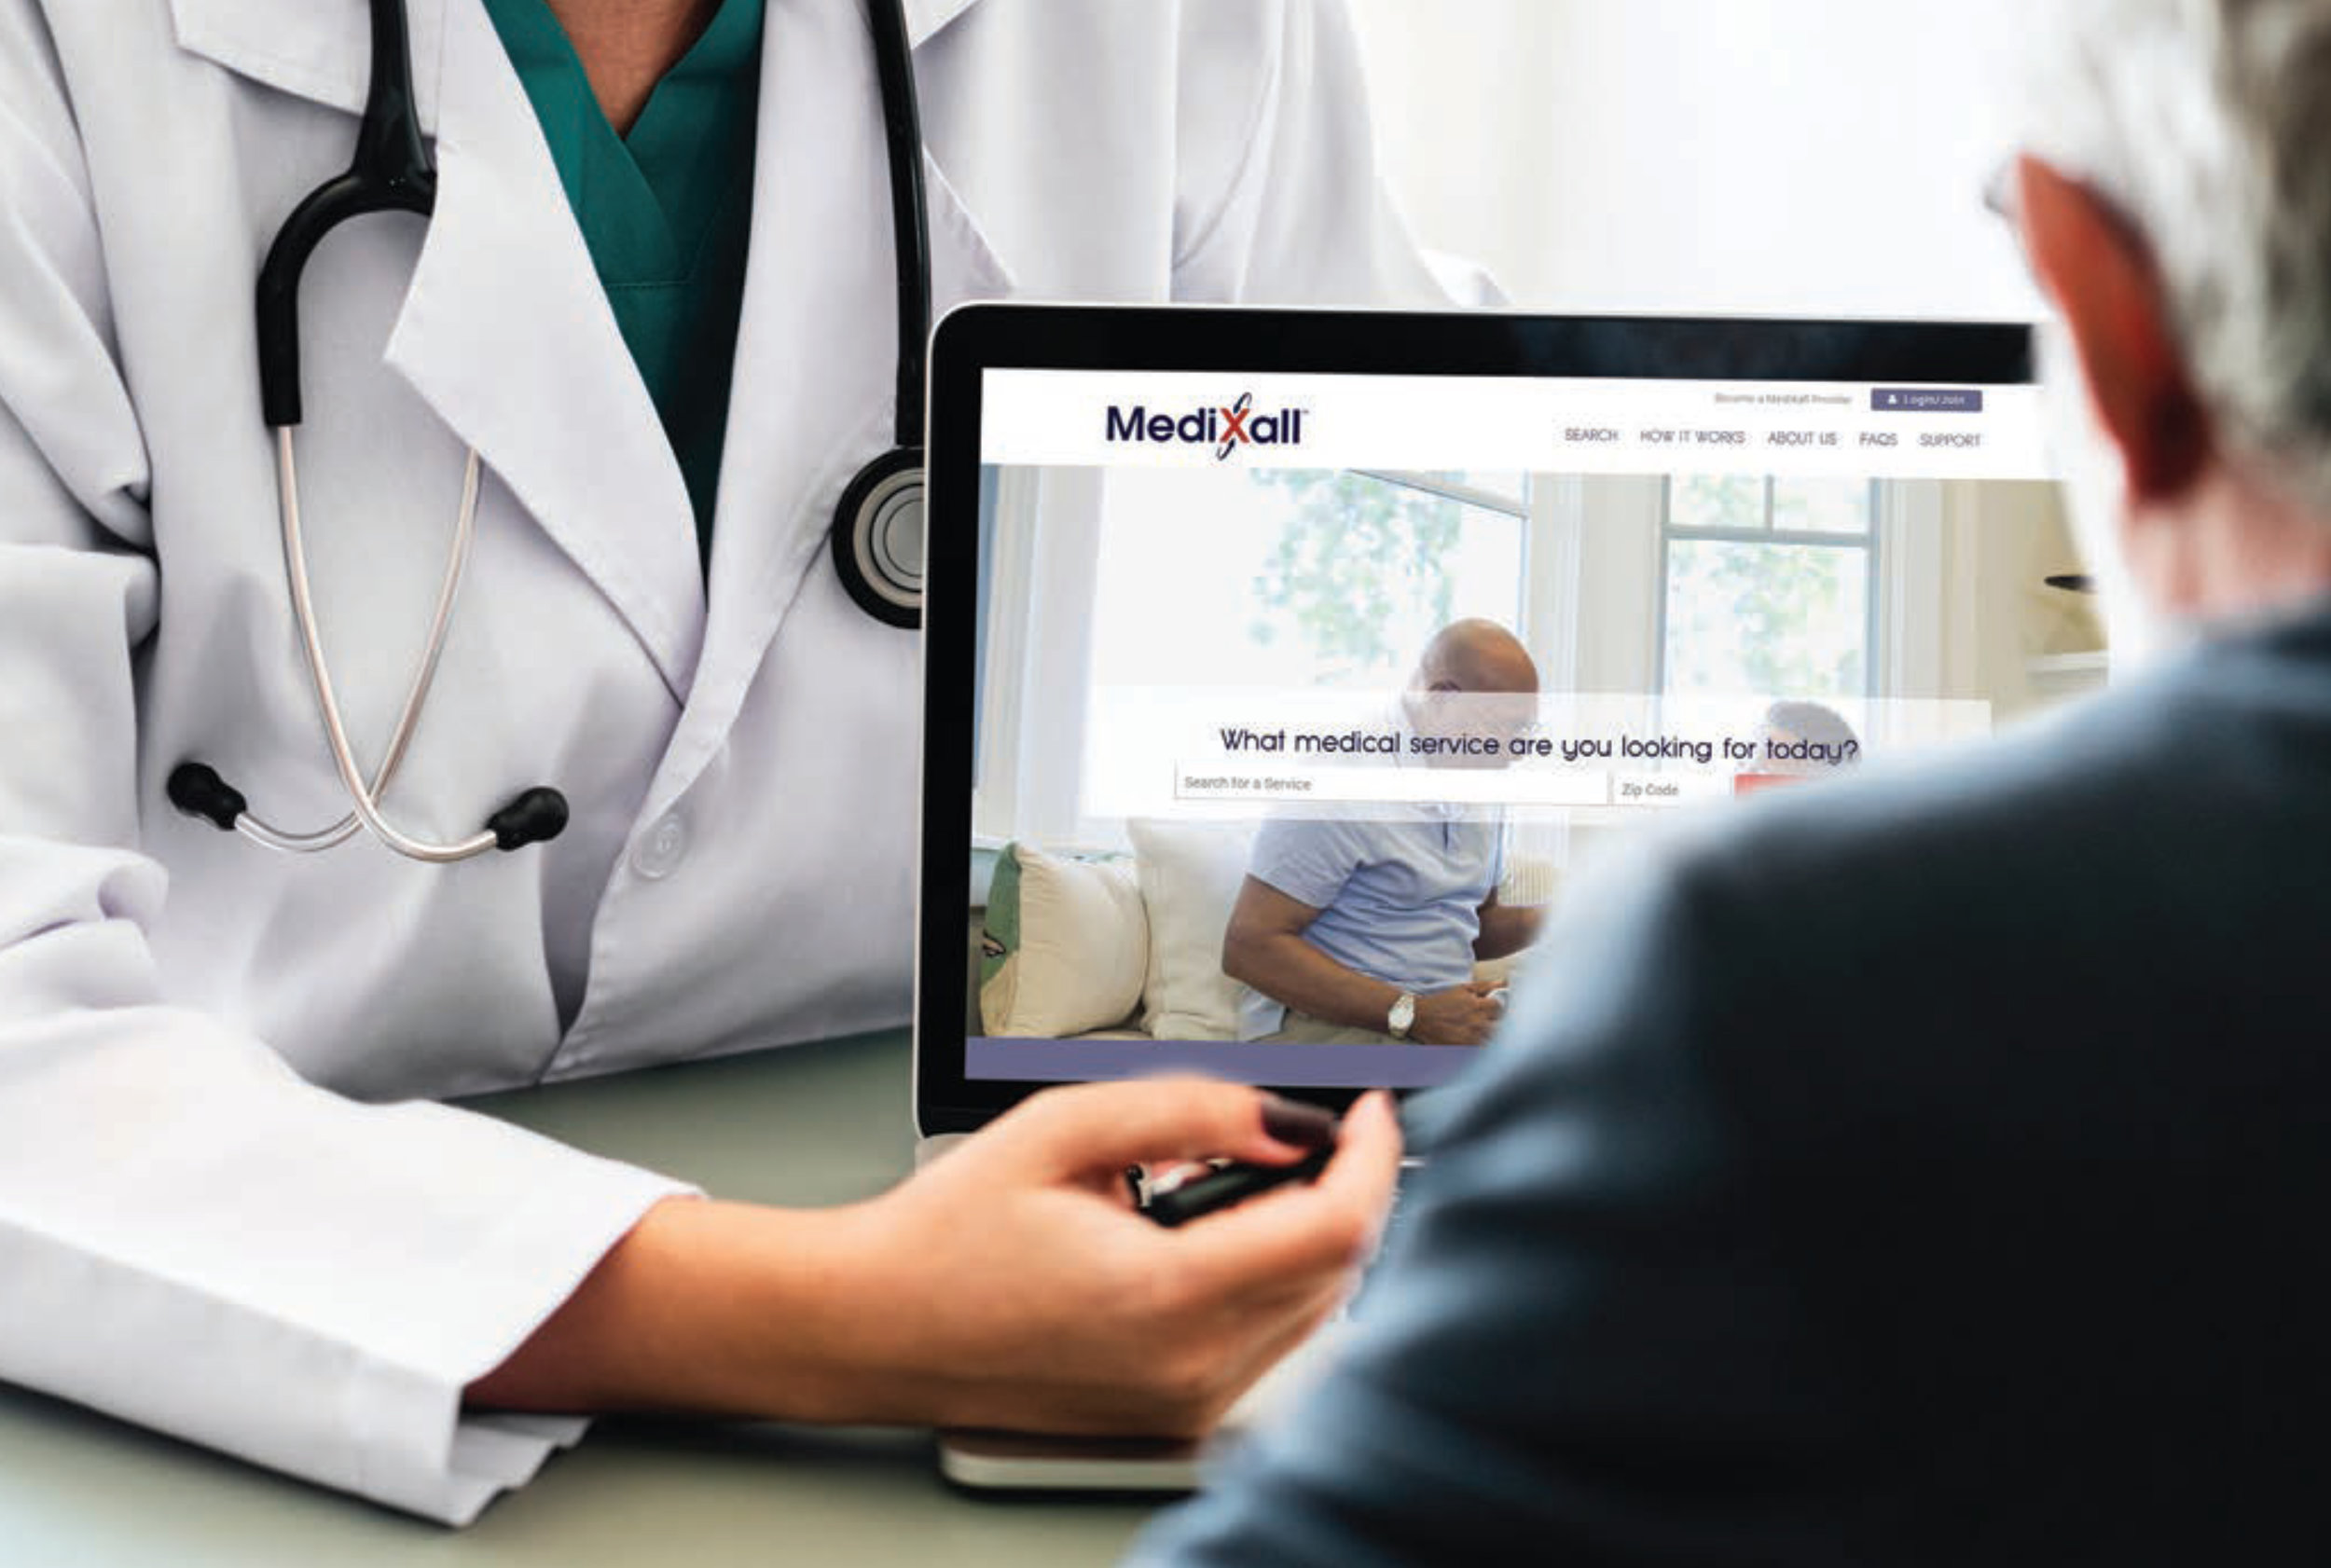 MediXall-deck-3.jpg